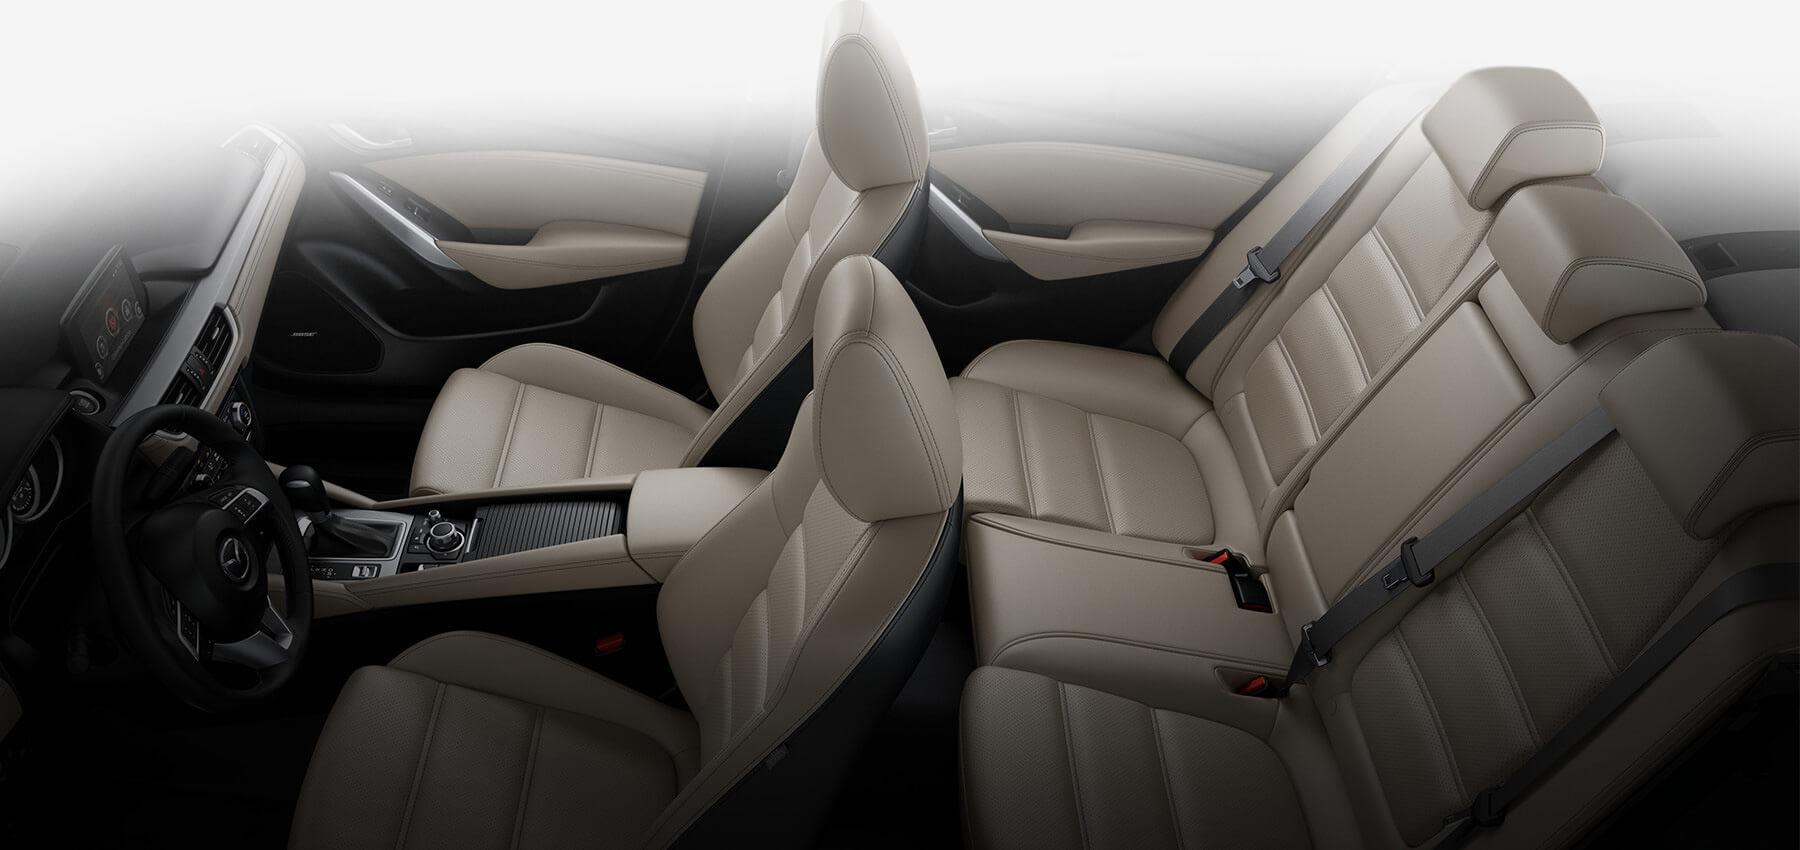 2017 Mazda6, Sand Leatherette